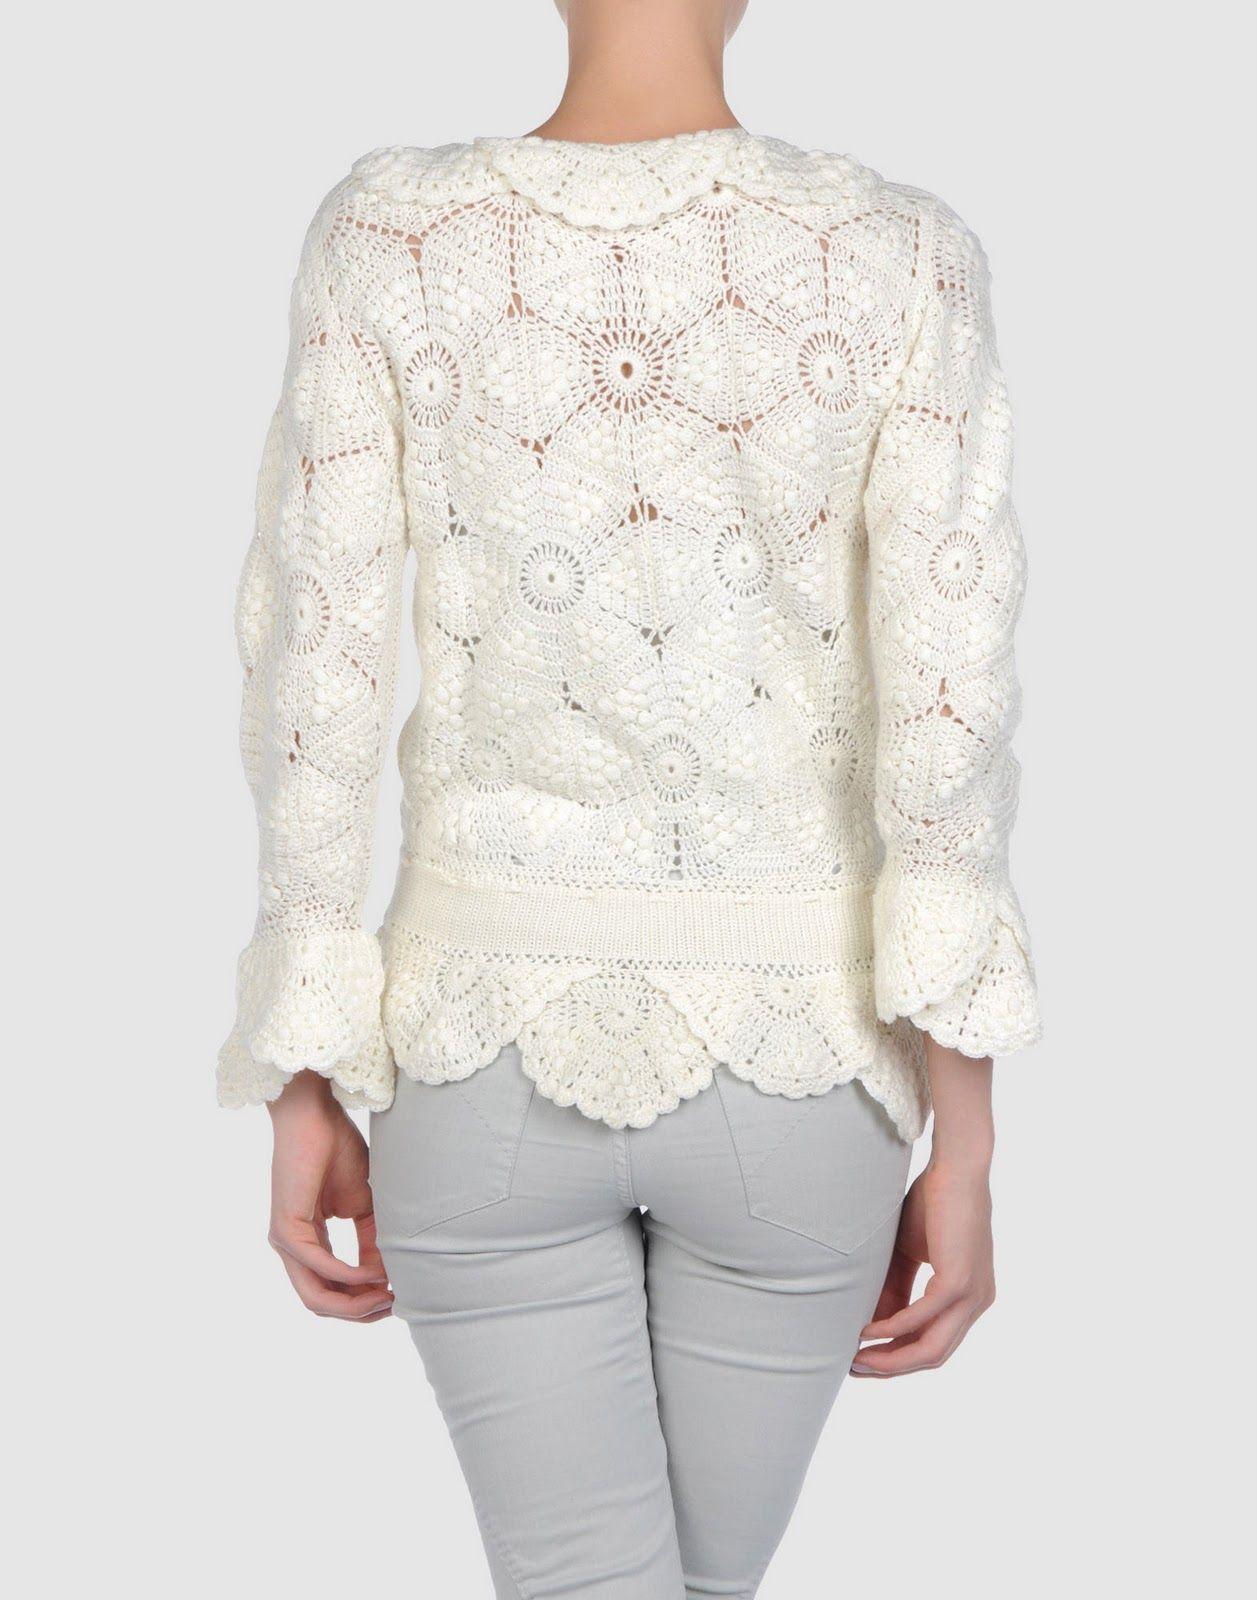 Outstanding Crochet: Dana Buf. Romantic Crochet Jacket.